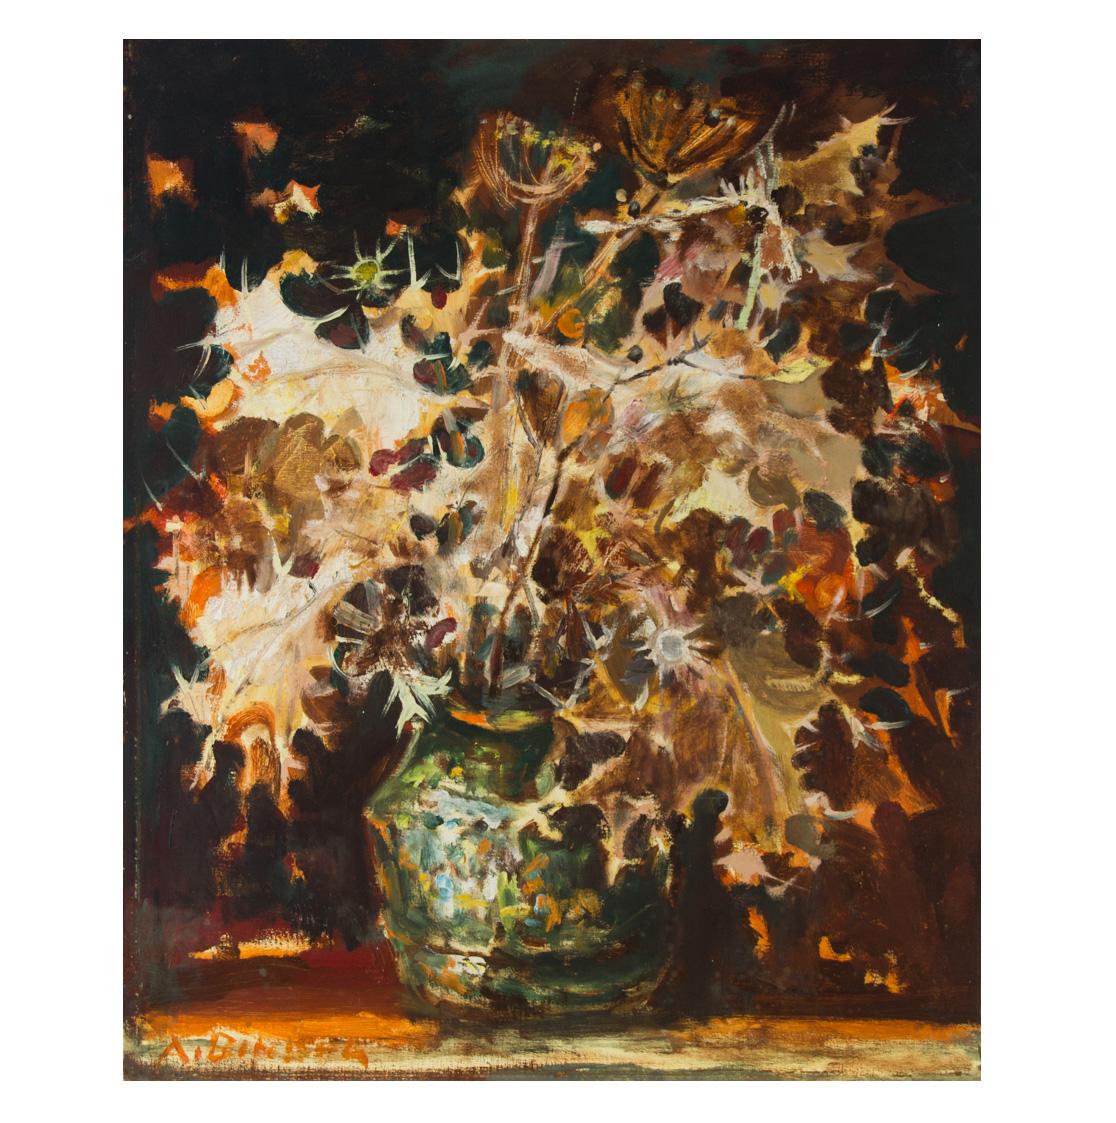 Avraham Binder (1906-2001) - 20th Century Oil, Still Life, Vase with Flowers